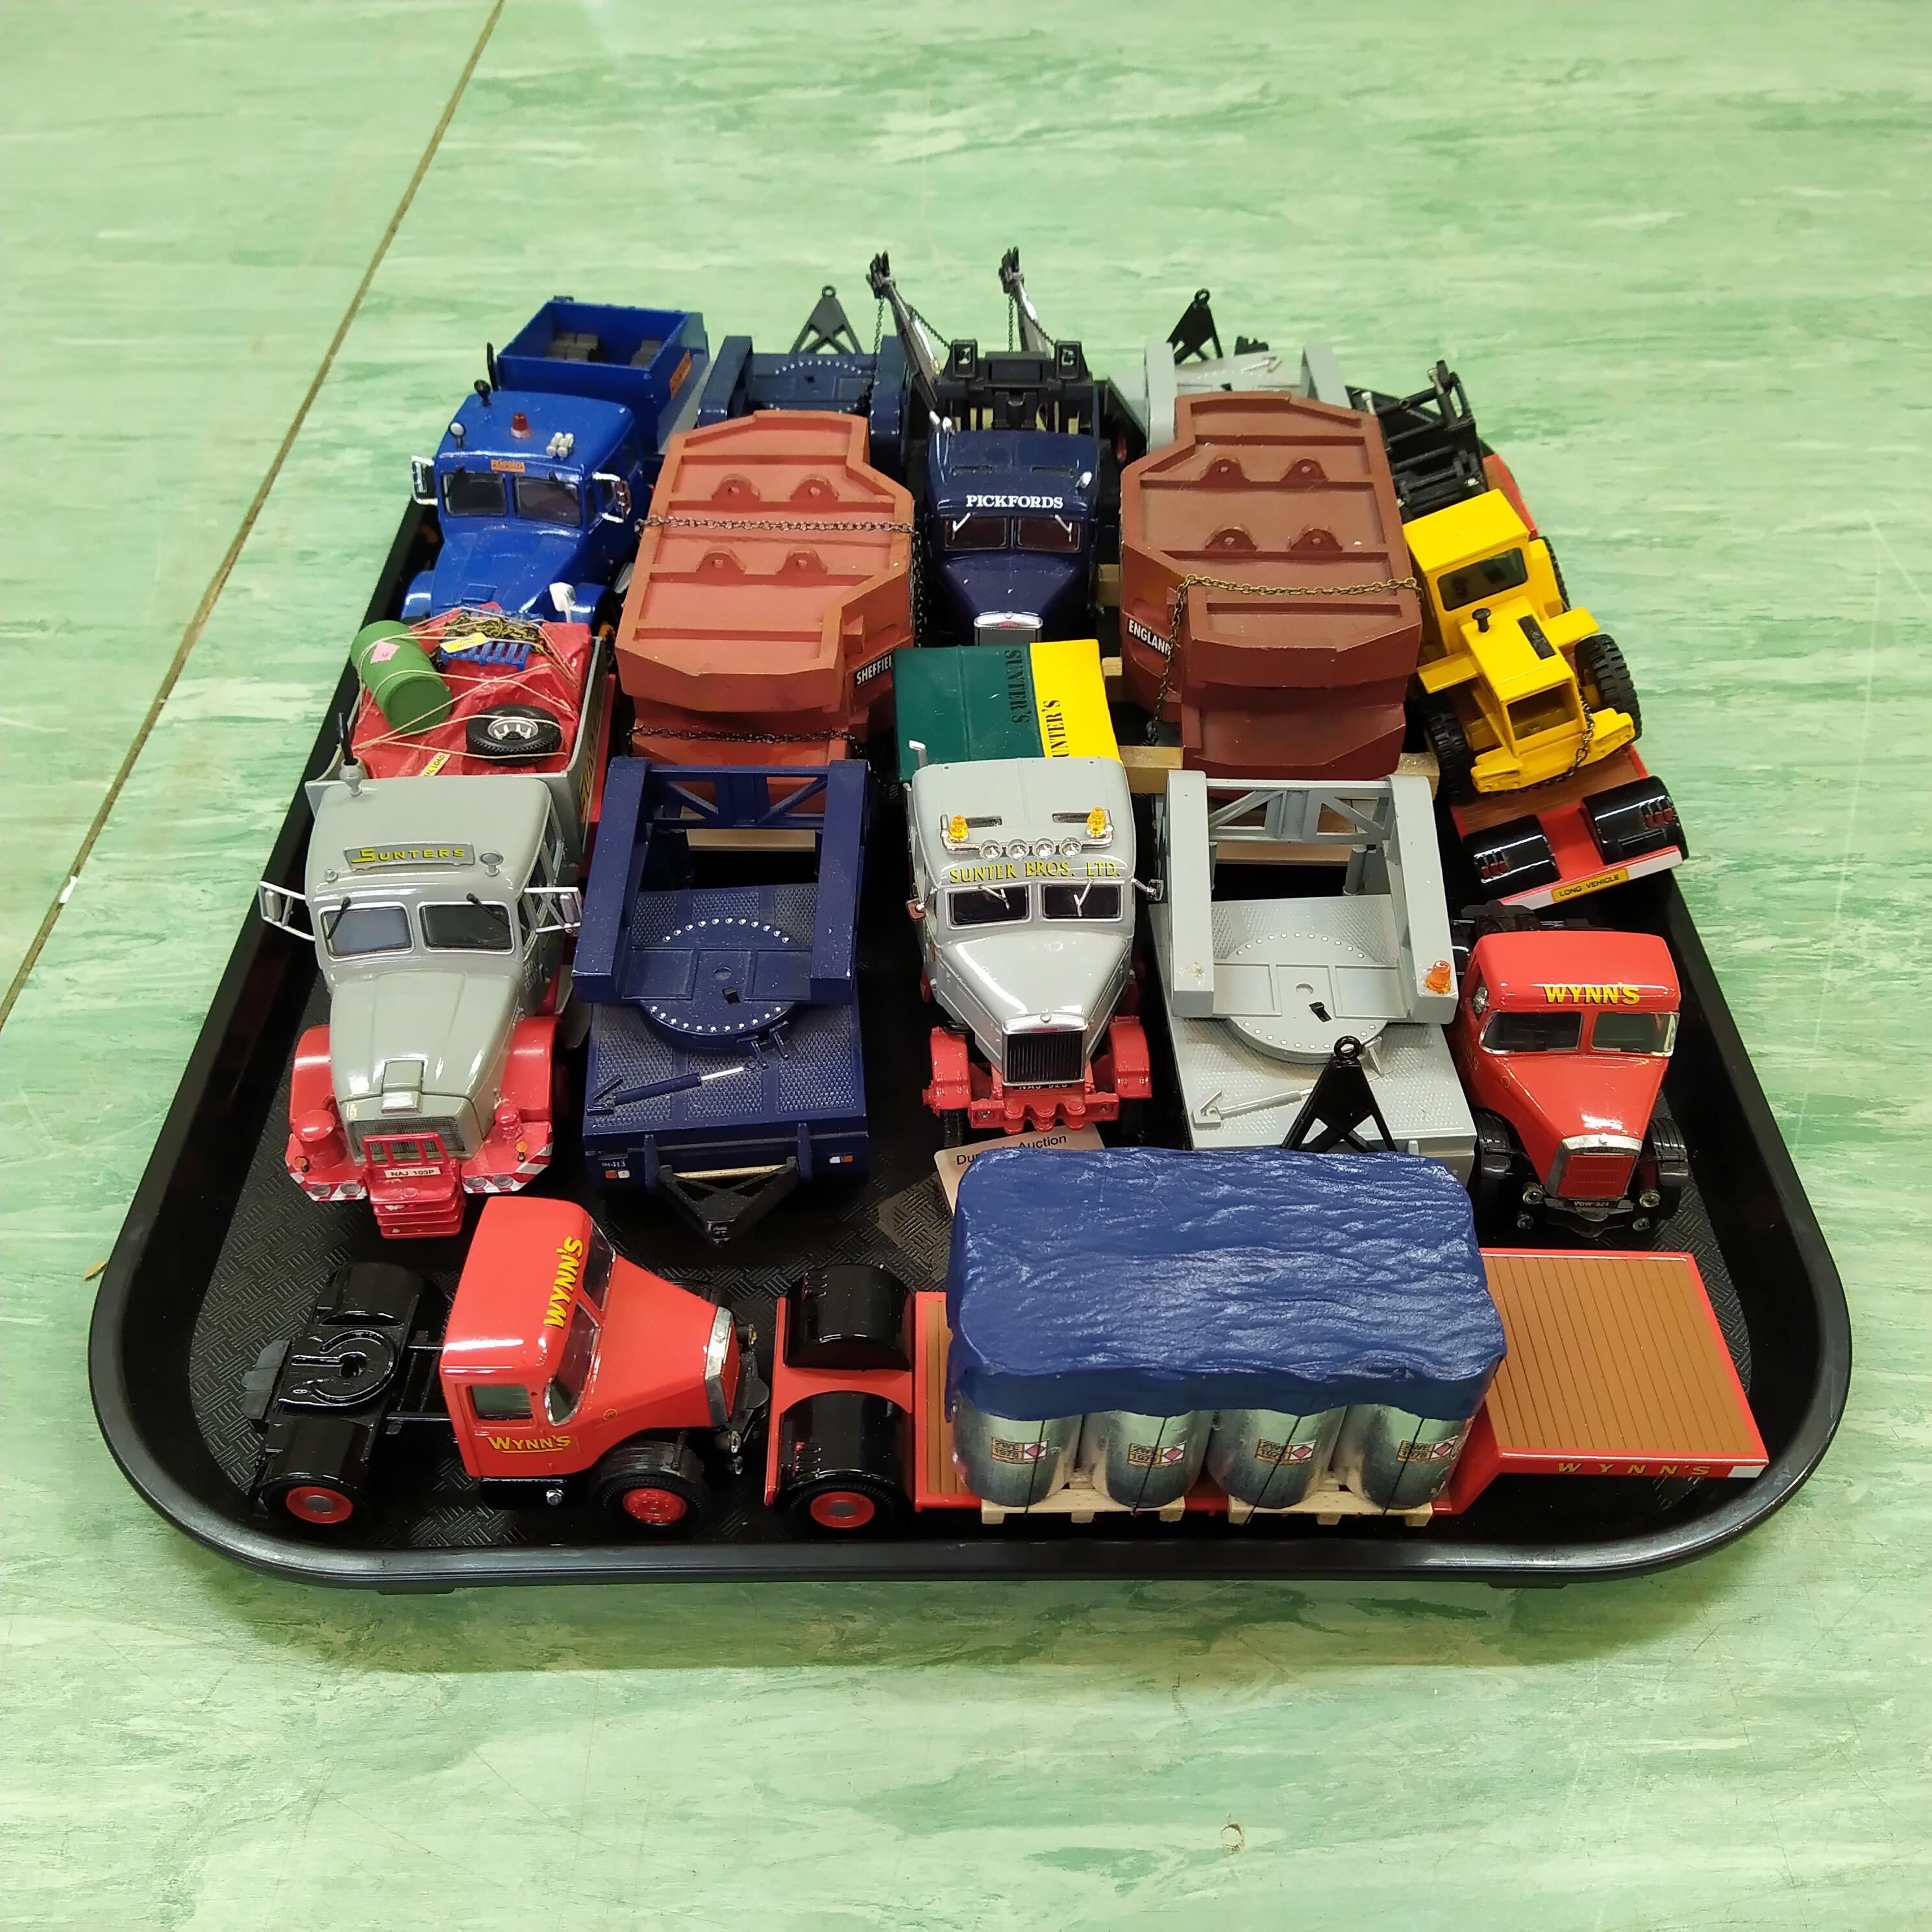 Six Corgi 1:50 scale heavy haulage low loaders